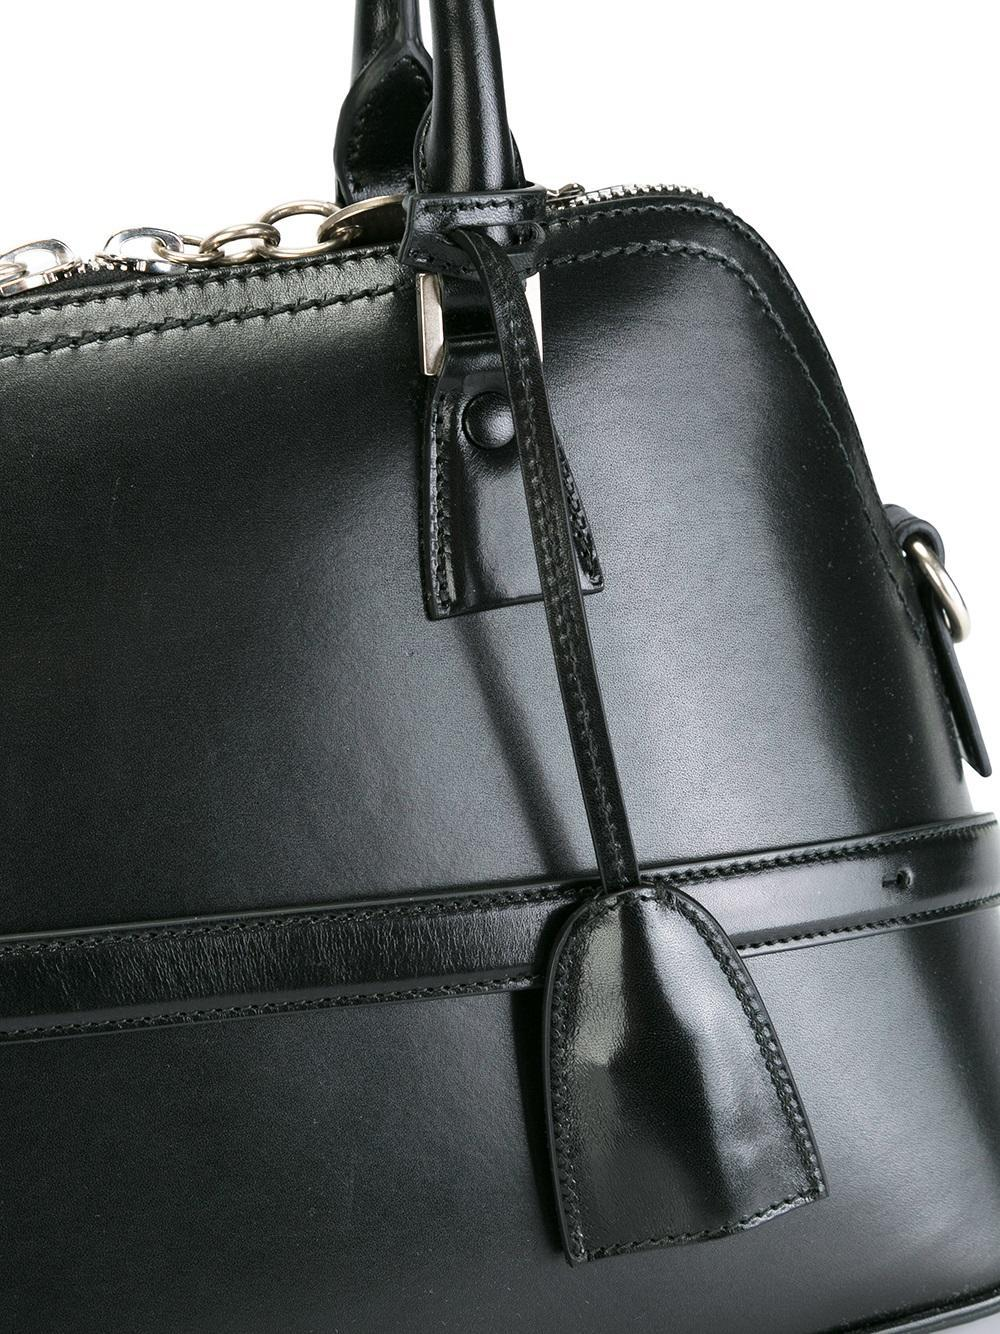 Maison Margiela Cotton Large '5ac' Tote in Black